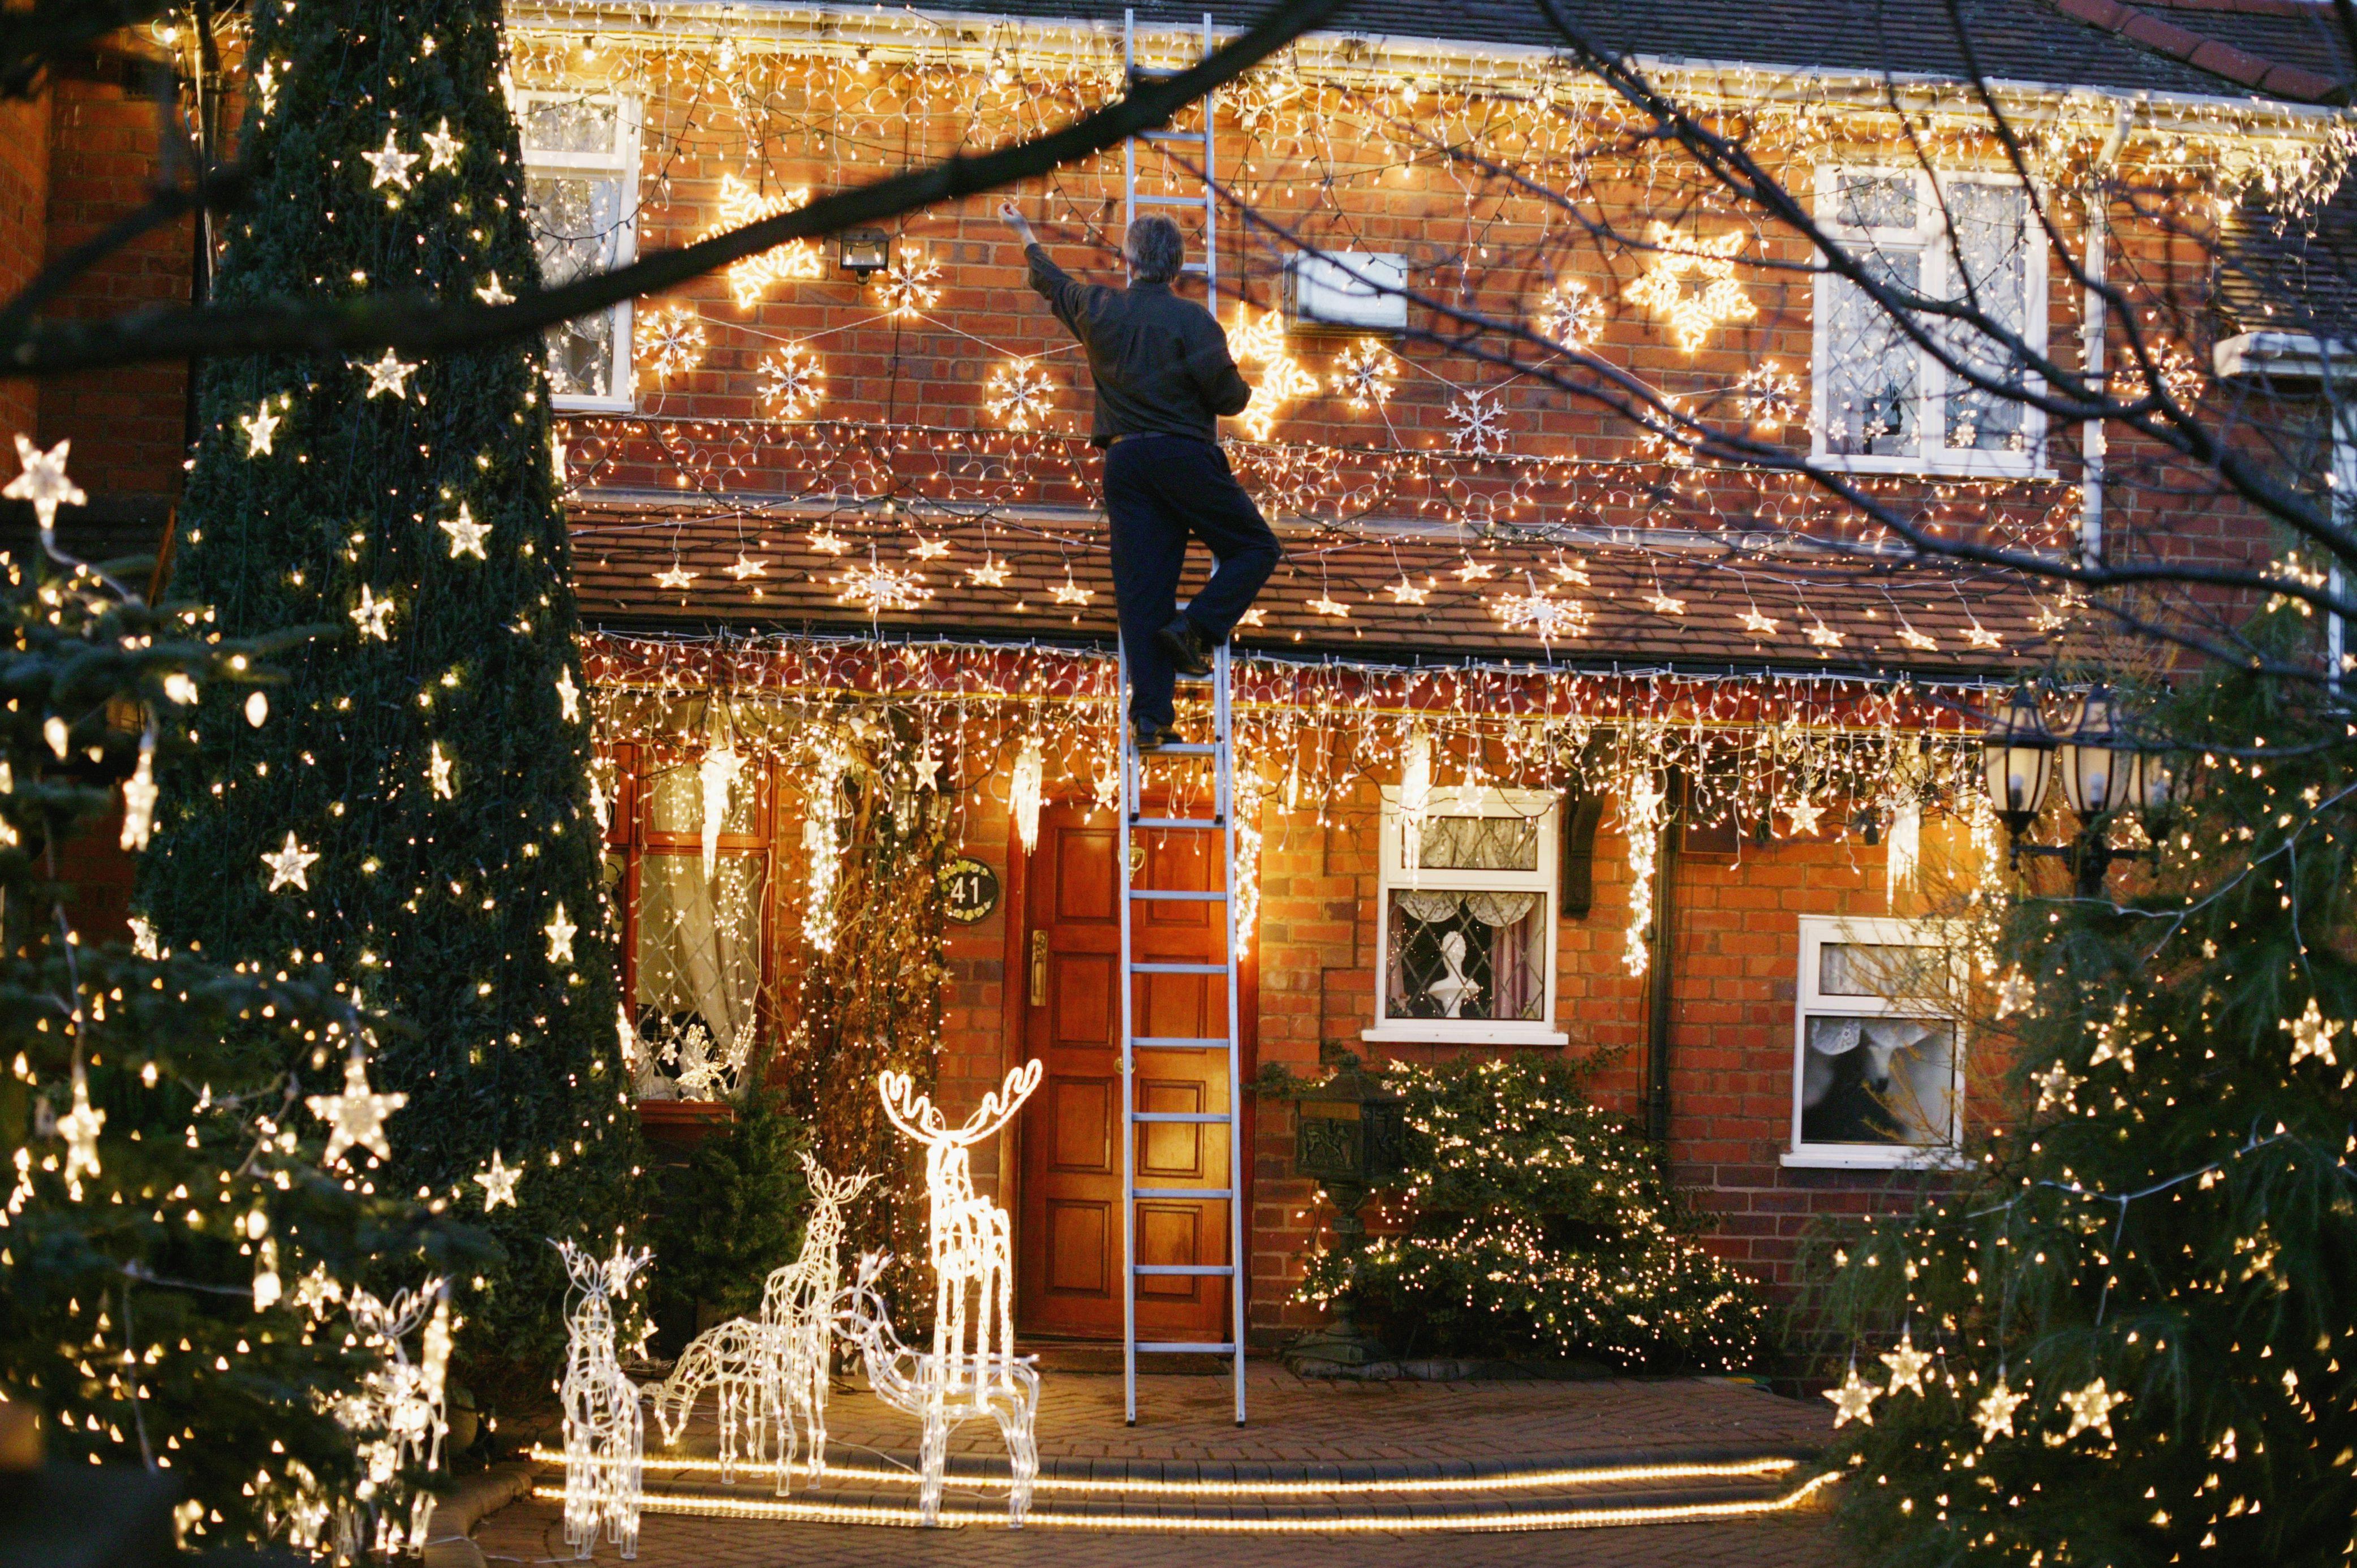 christmas lights in the front garden of a house 5a1ef4ff4e46ba001a9ac0bf